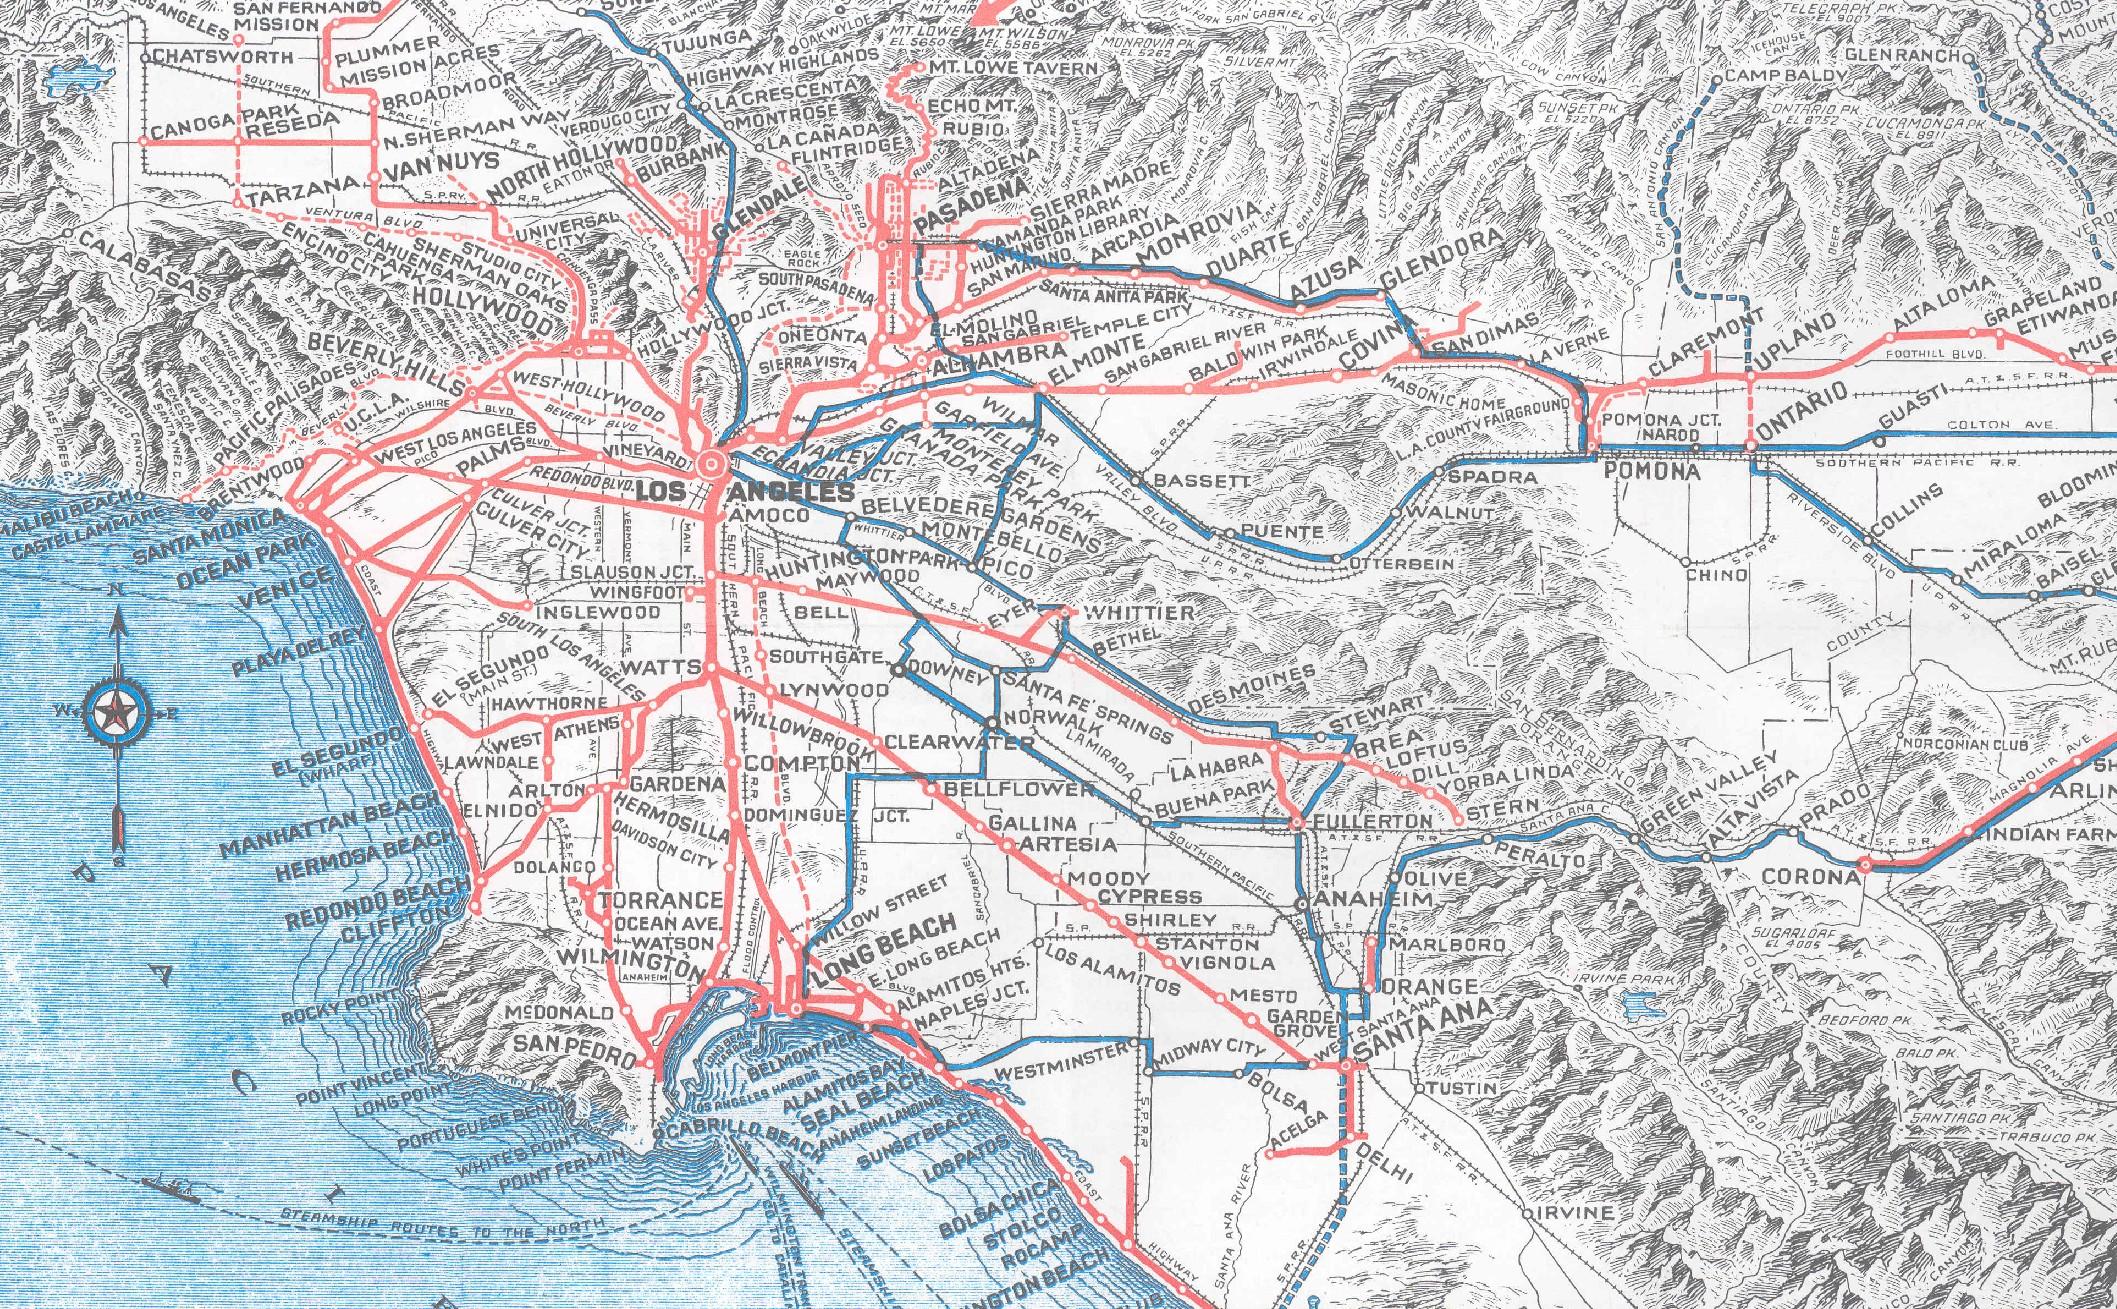 Drawn power line city los angeles Pacific Percent 25 Mileage 01